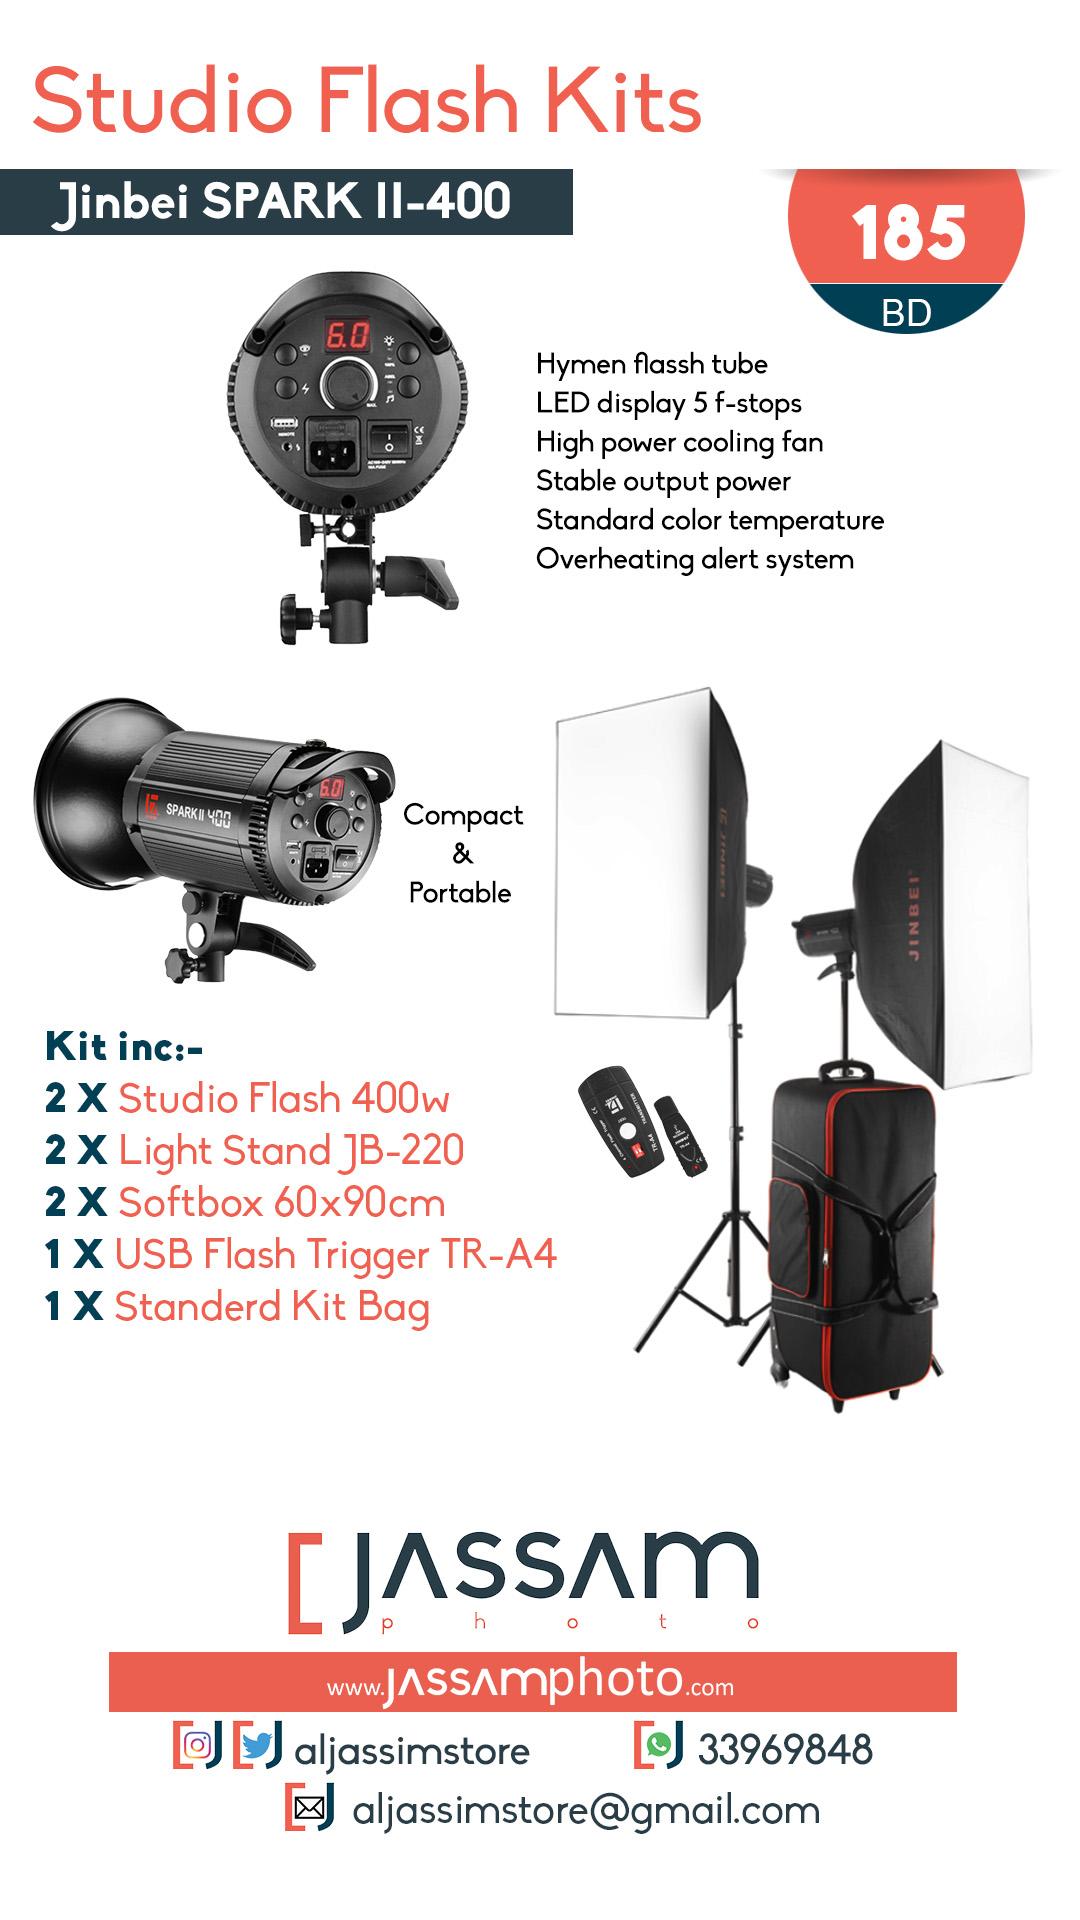 Studio Flash Kit SparkII-400